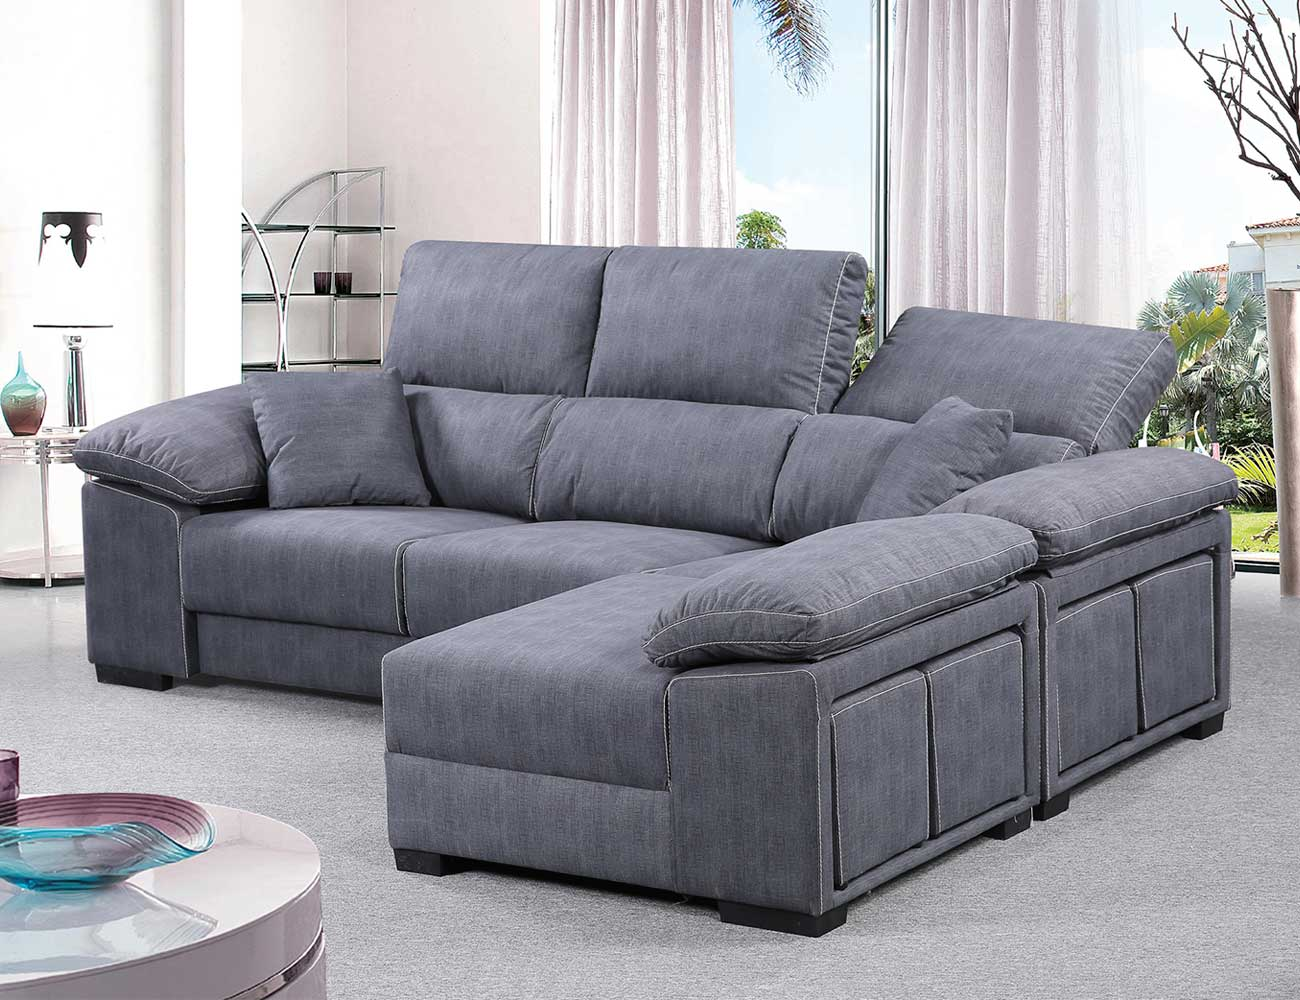 Sofa chaiselongue reversible 4 taburetes asientos extraible gris ceniza